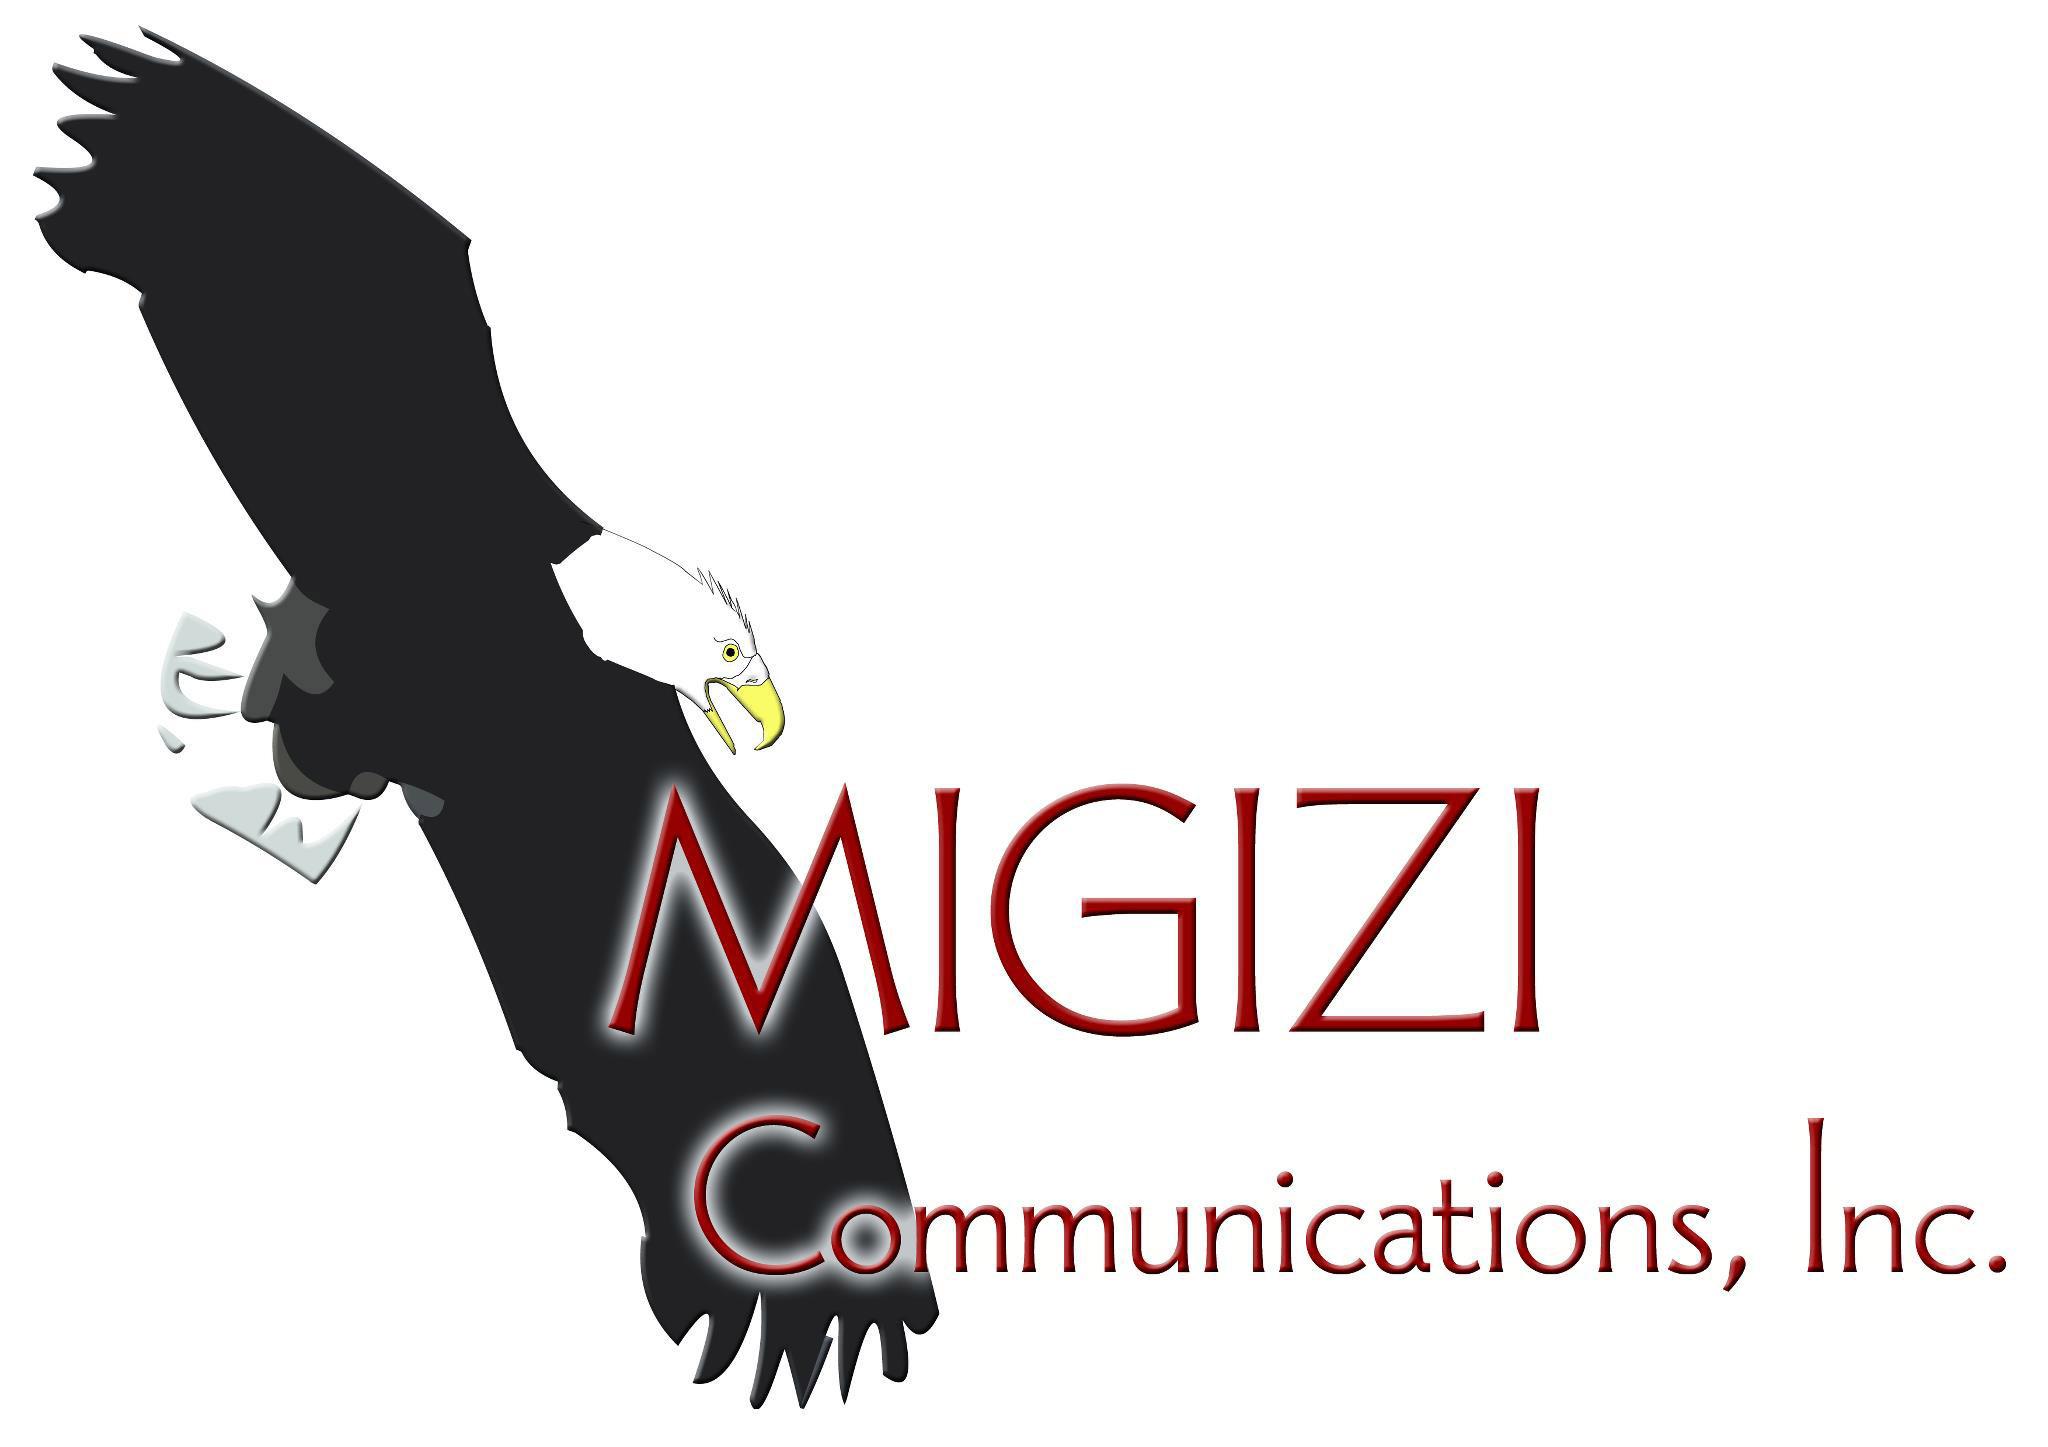 Migizi Communications.jpg